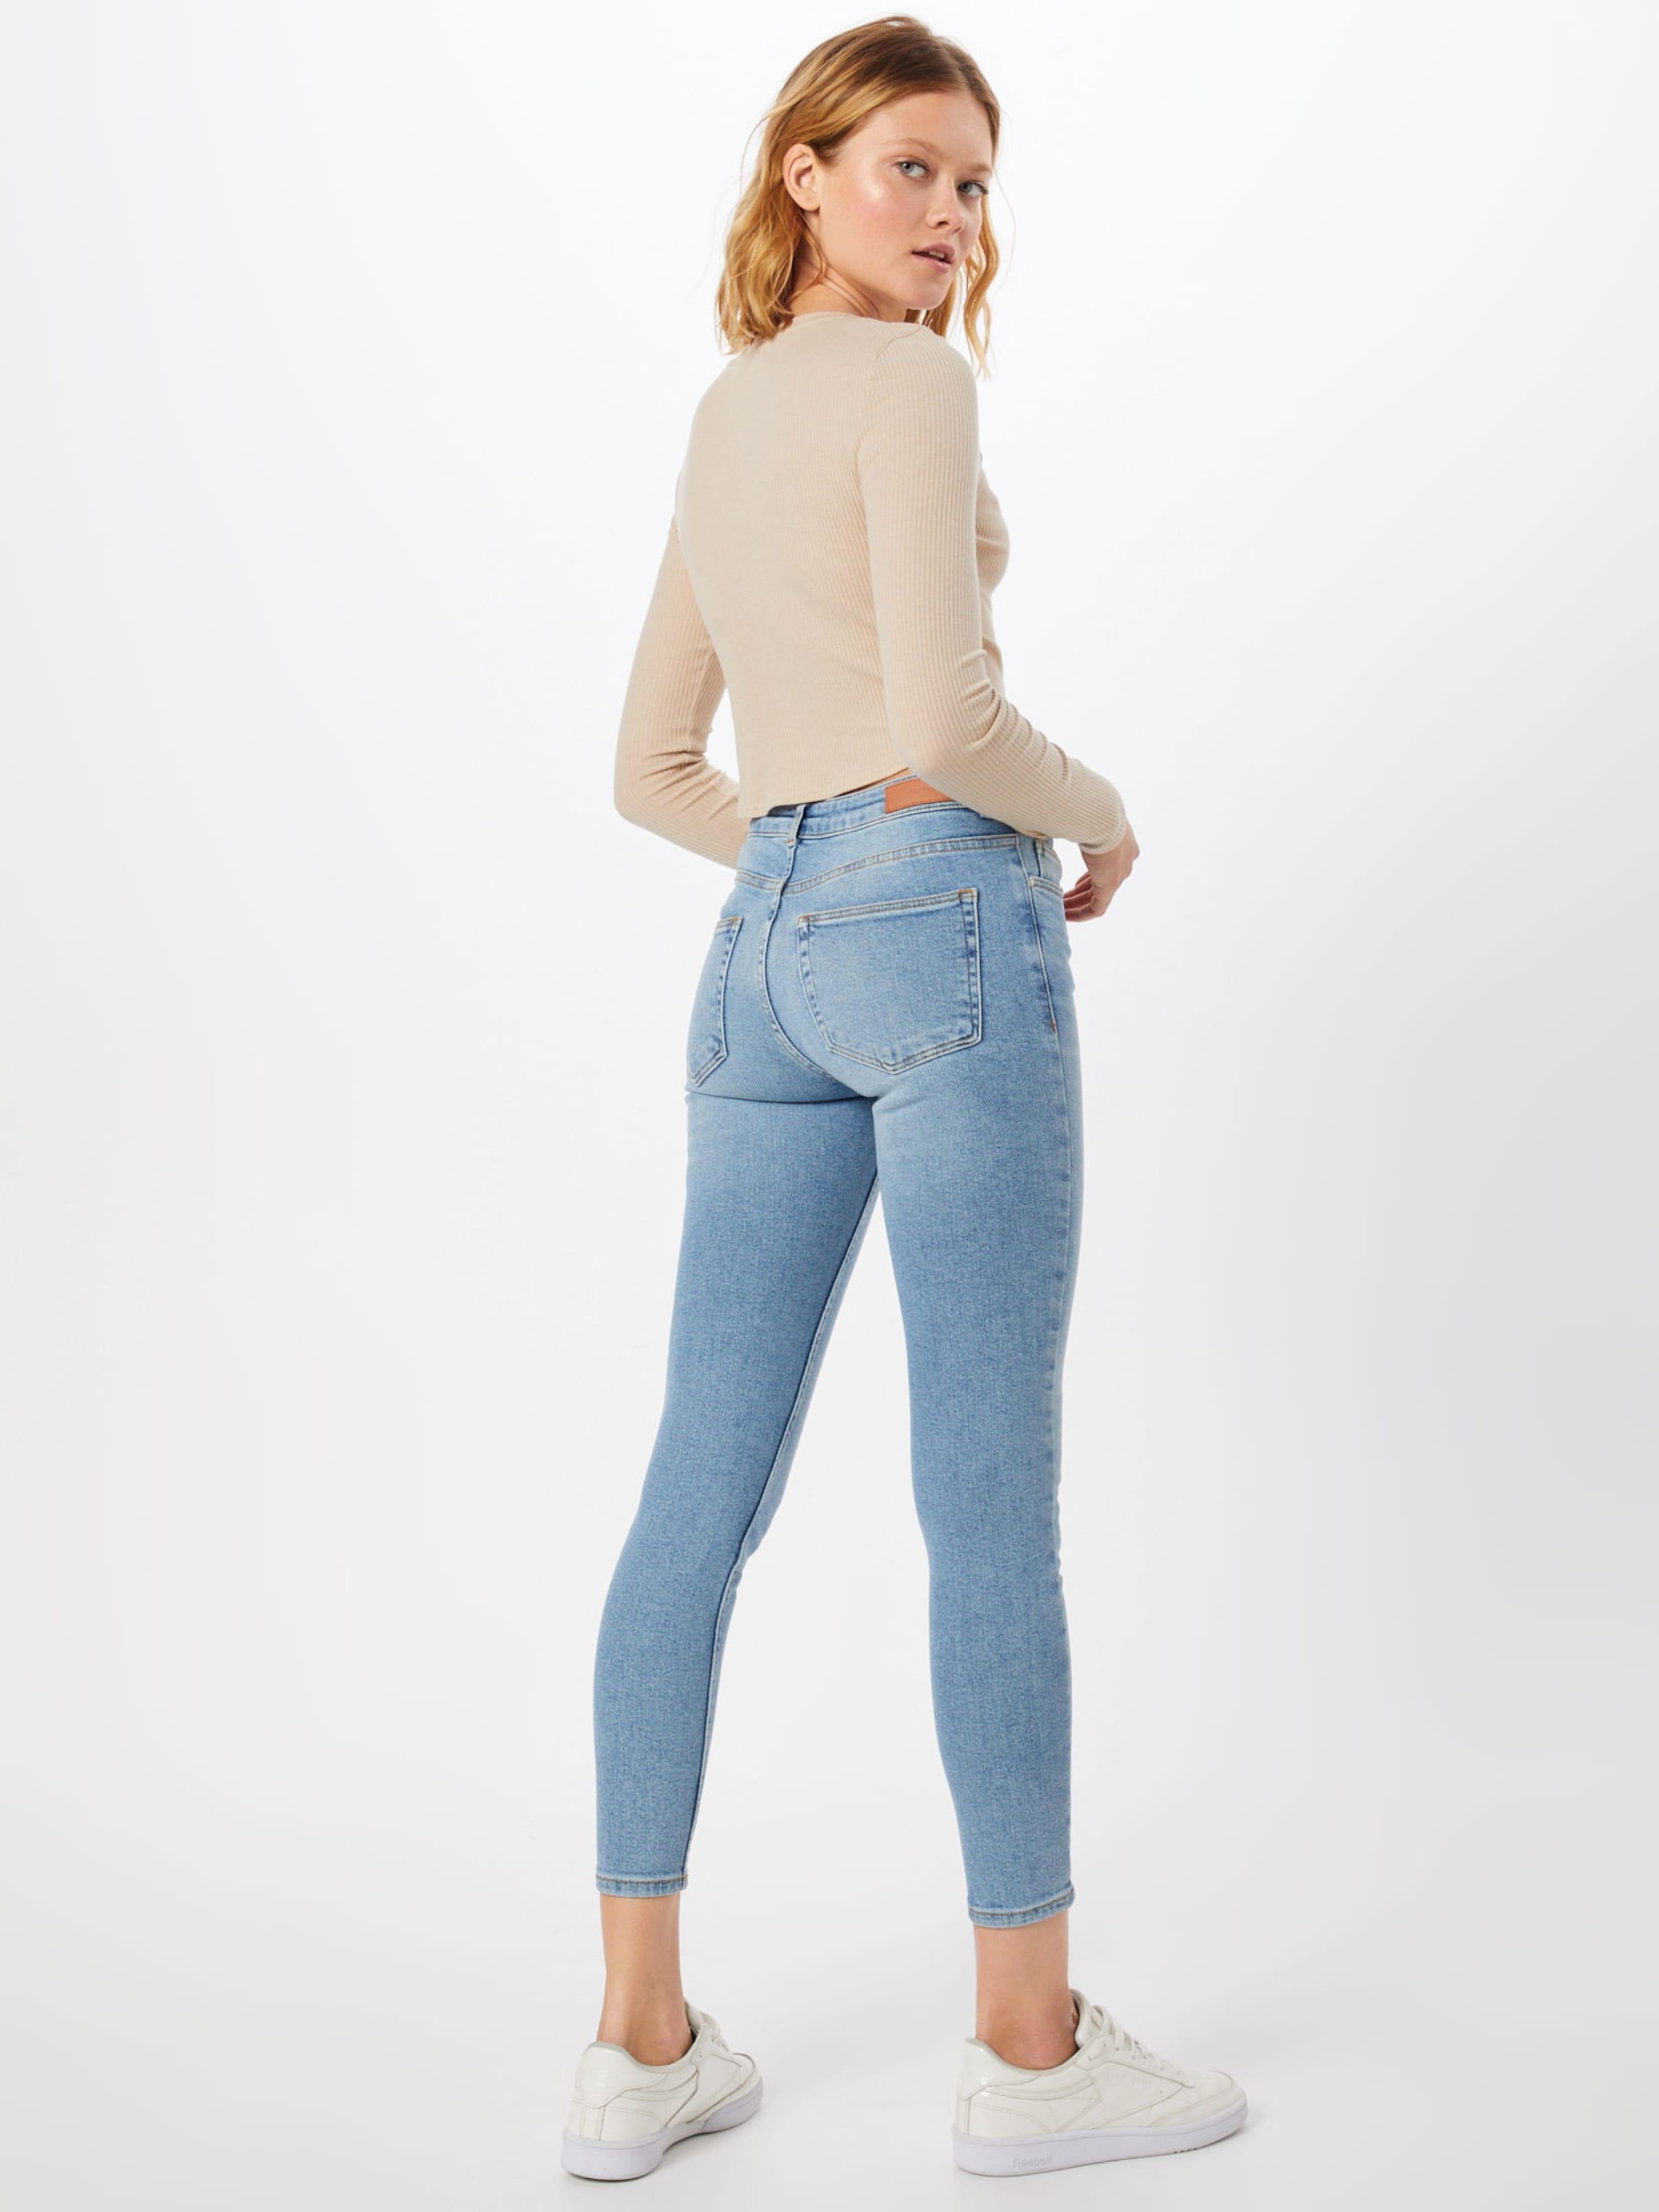 Bleu Blue D Mid Jean 'skinny En Review Denim jeans' DH9EWI2